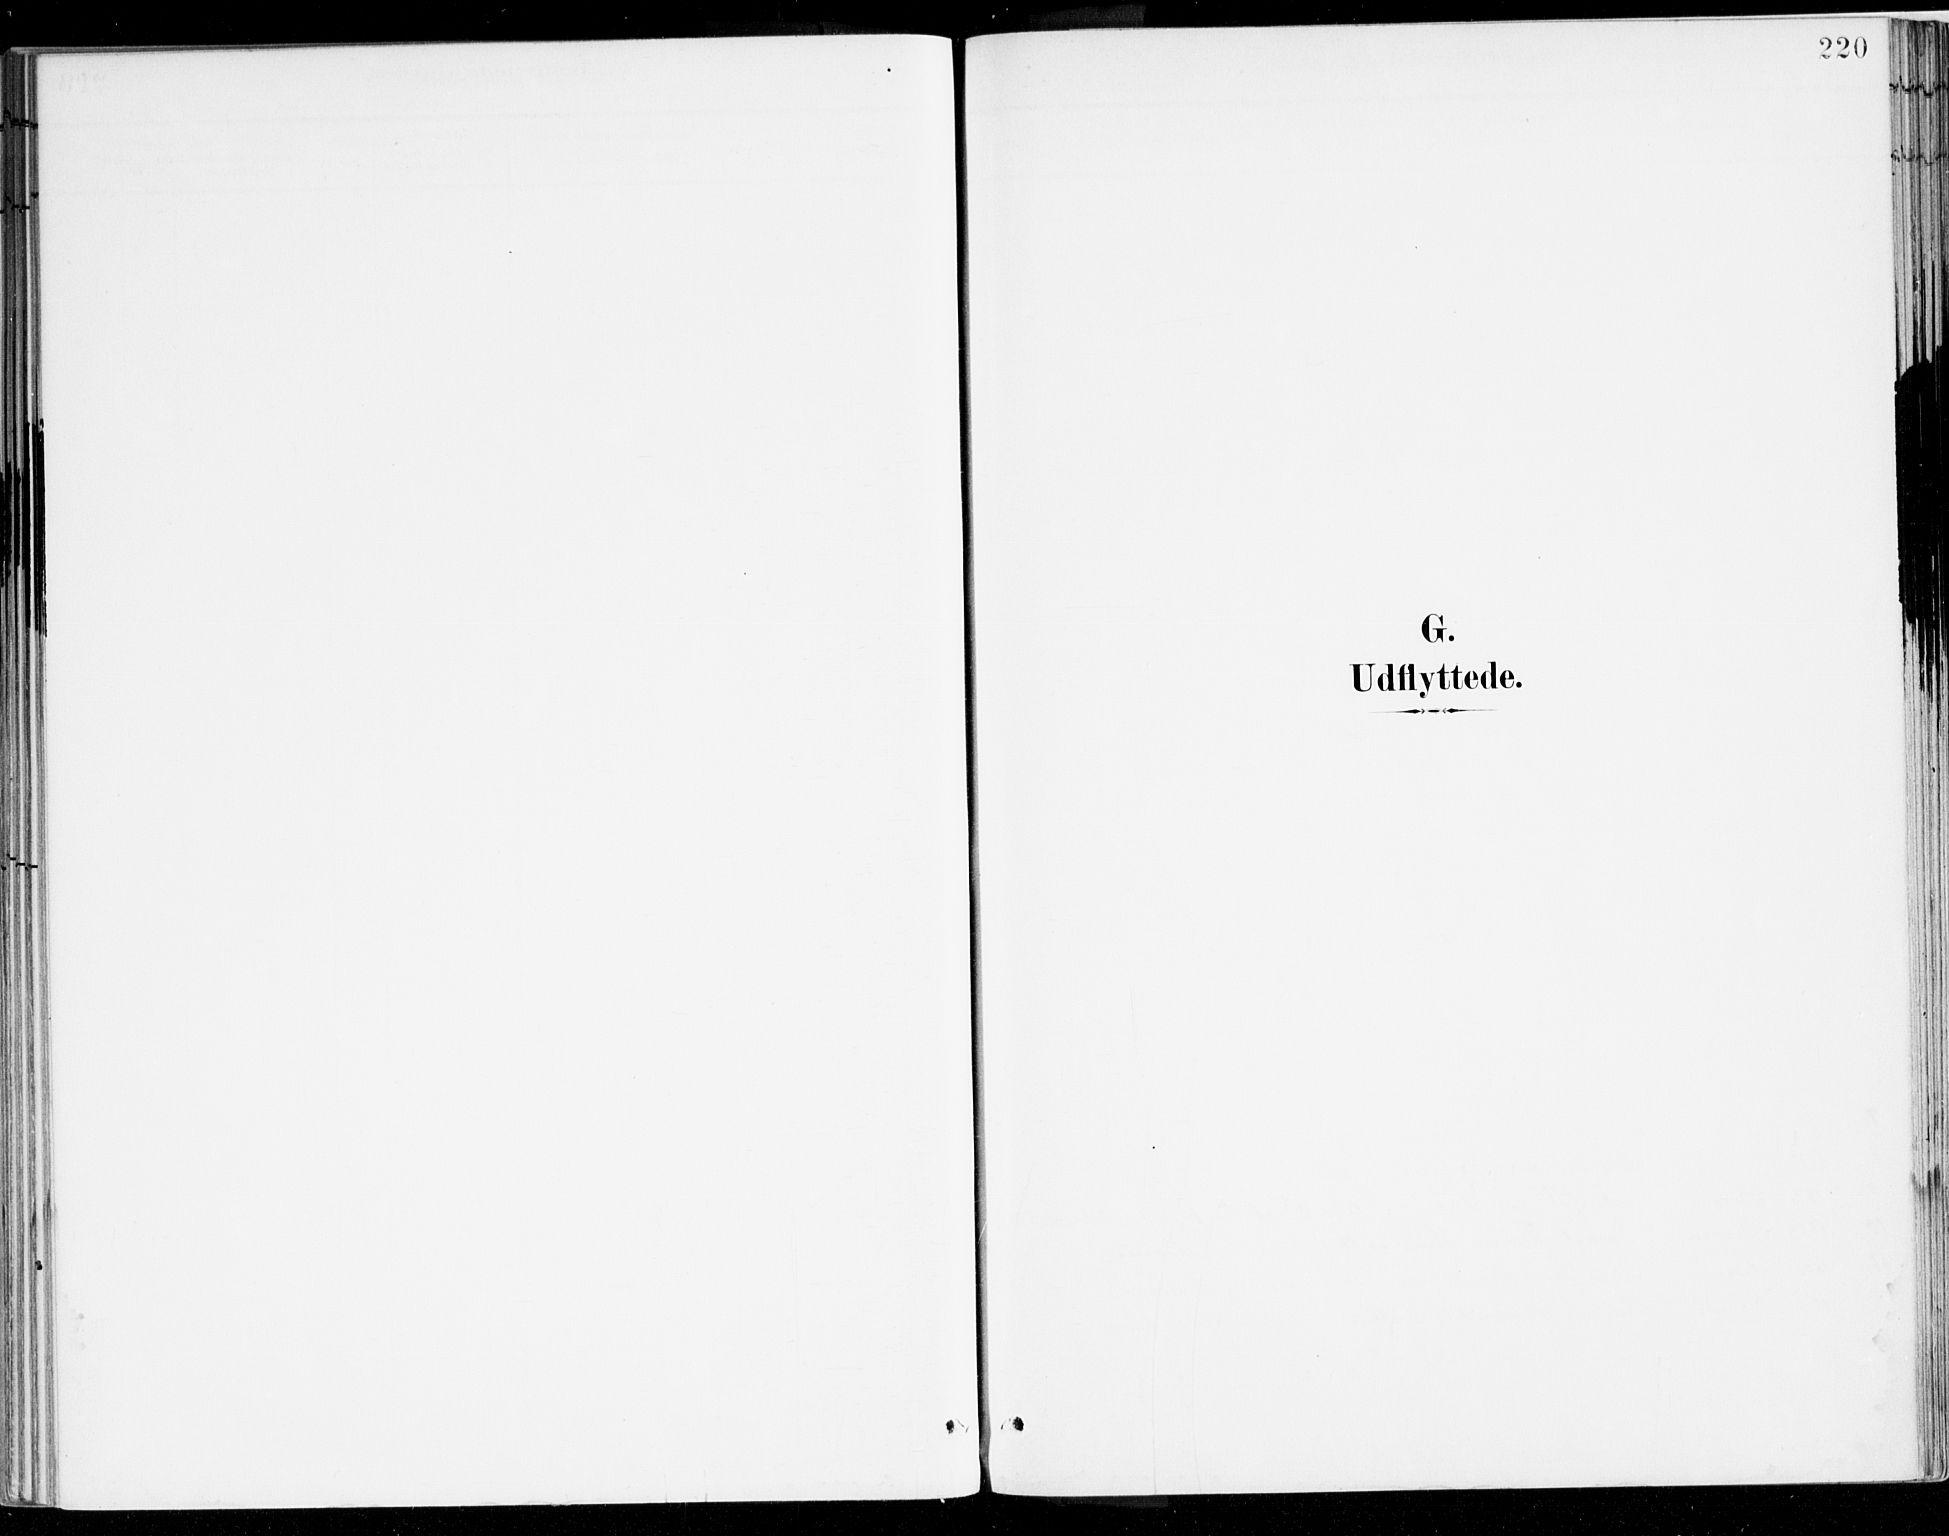 SAB, Lavik Sokneprestembete, Ministerialbok nr. B 1, 1882-1908, s. 220